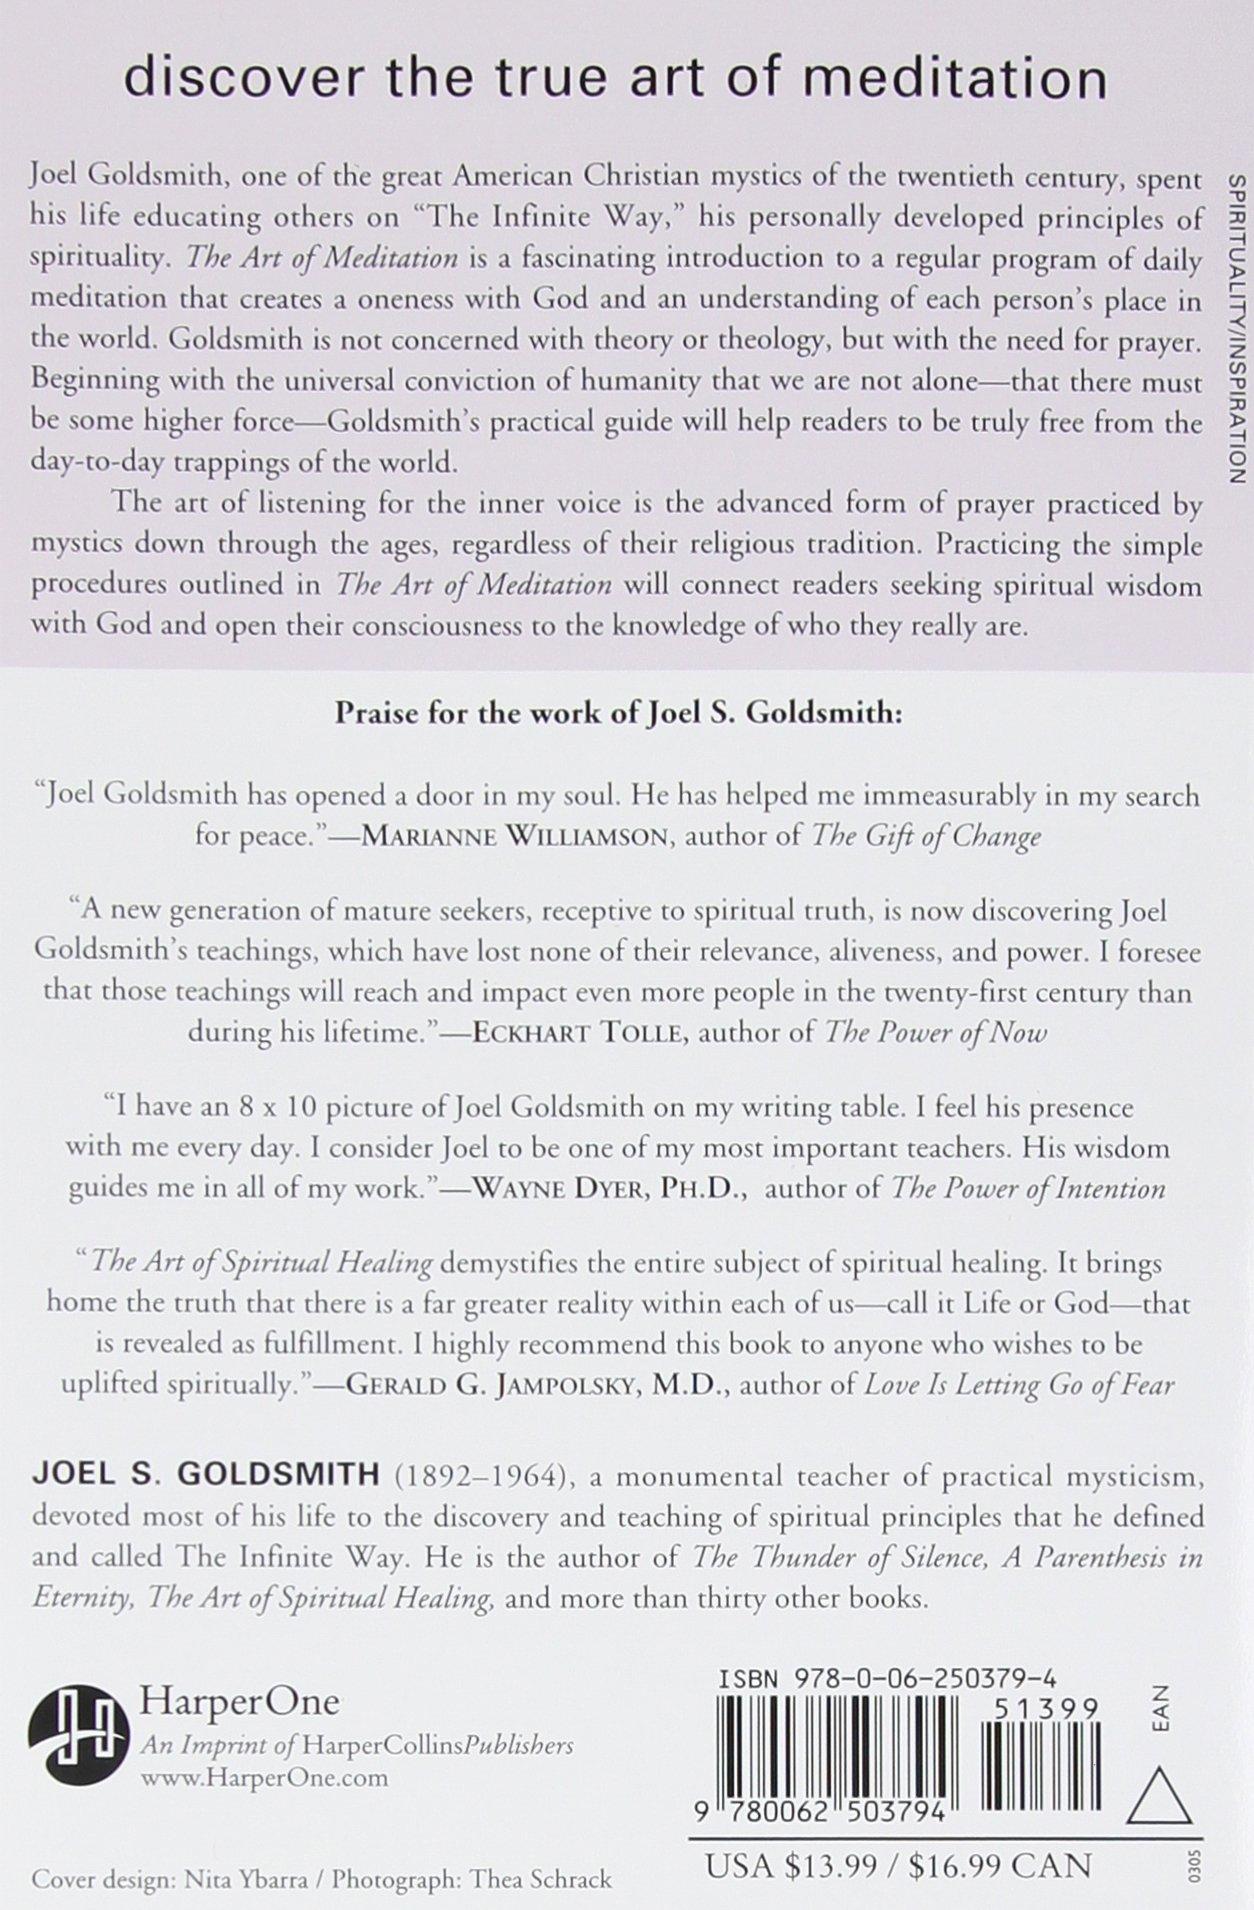 The art of meditation joel s goldsmith 9780062503794 amazon com books